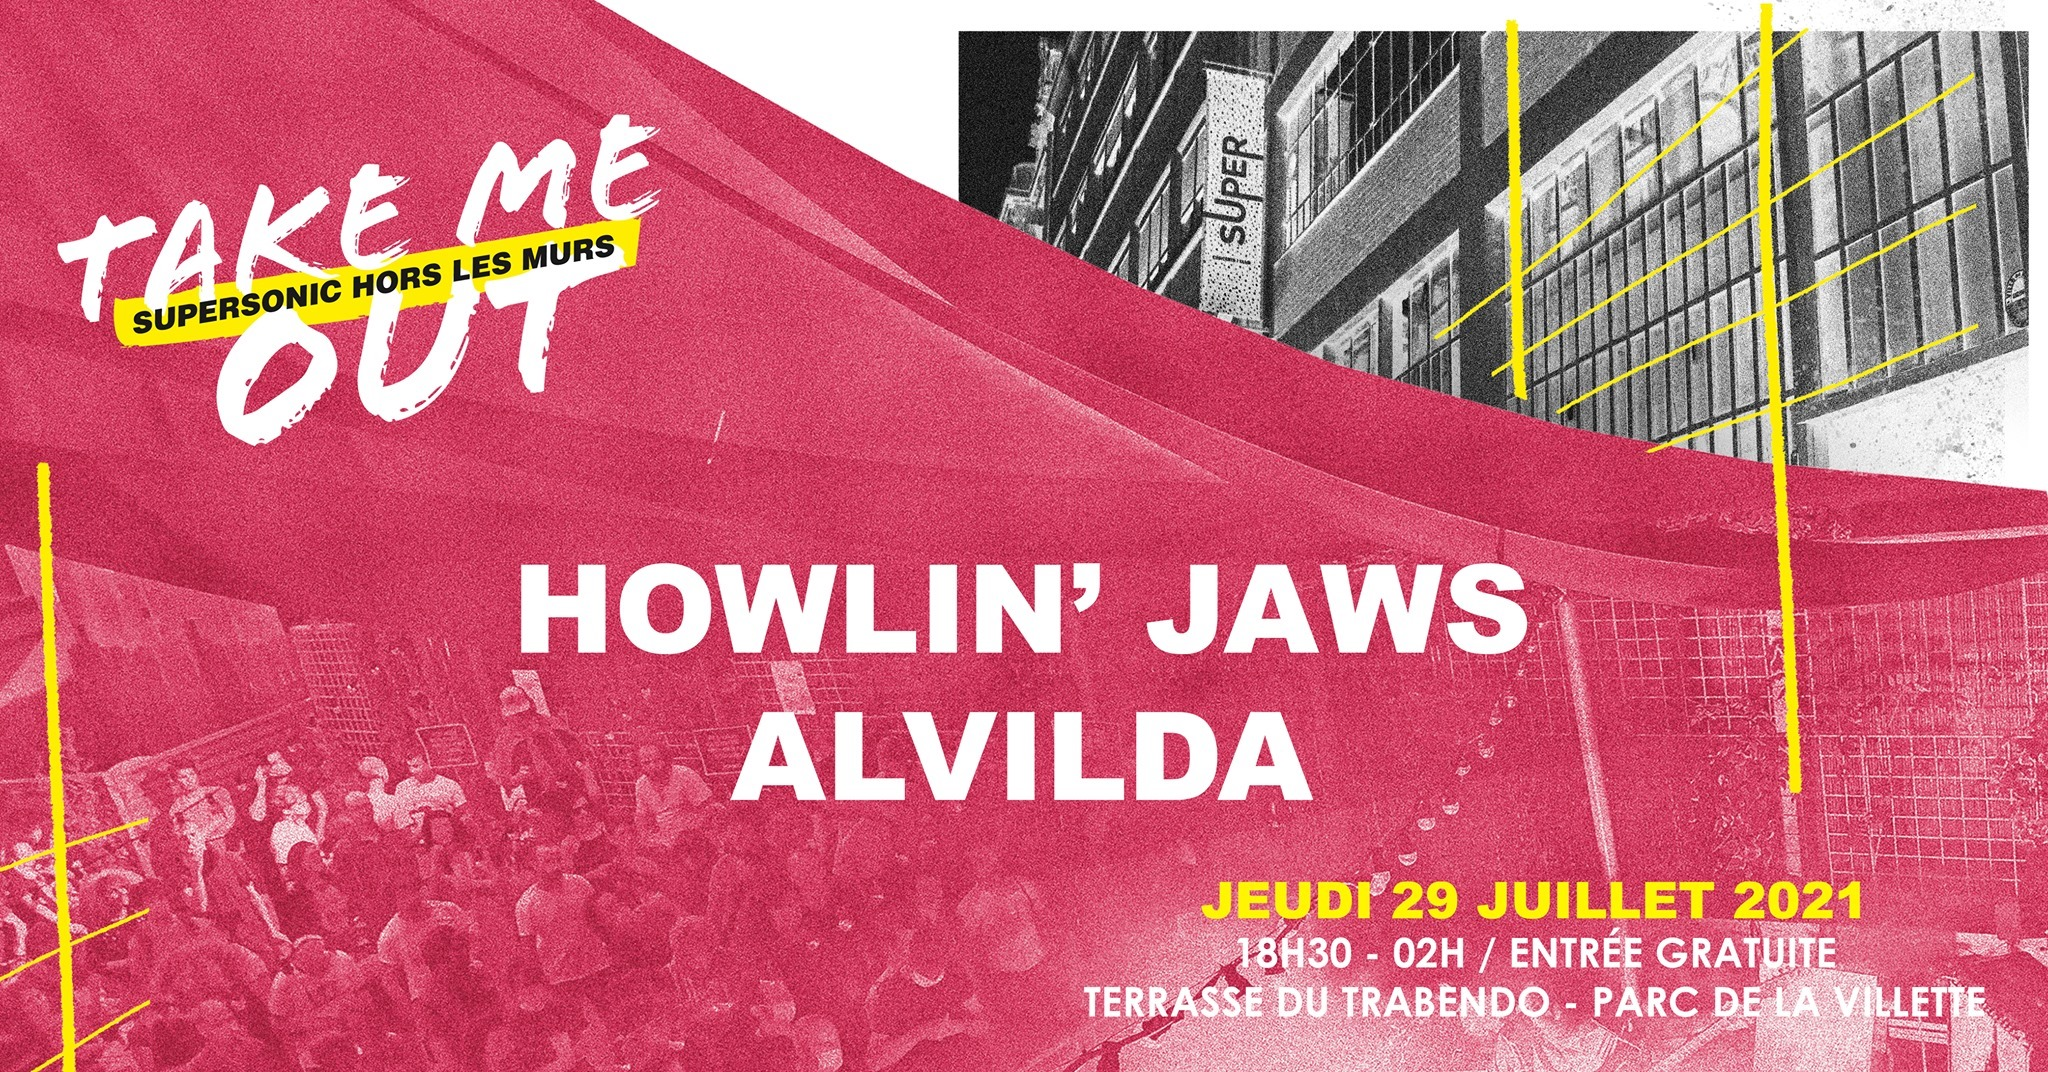 Howlin' Jaws • Alvilda / Take Me Out Terrasse du Trabendo Paris